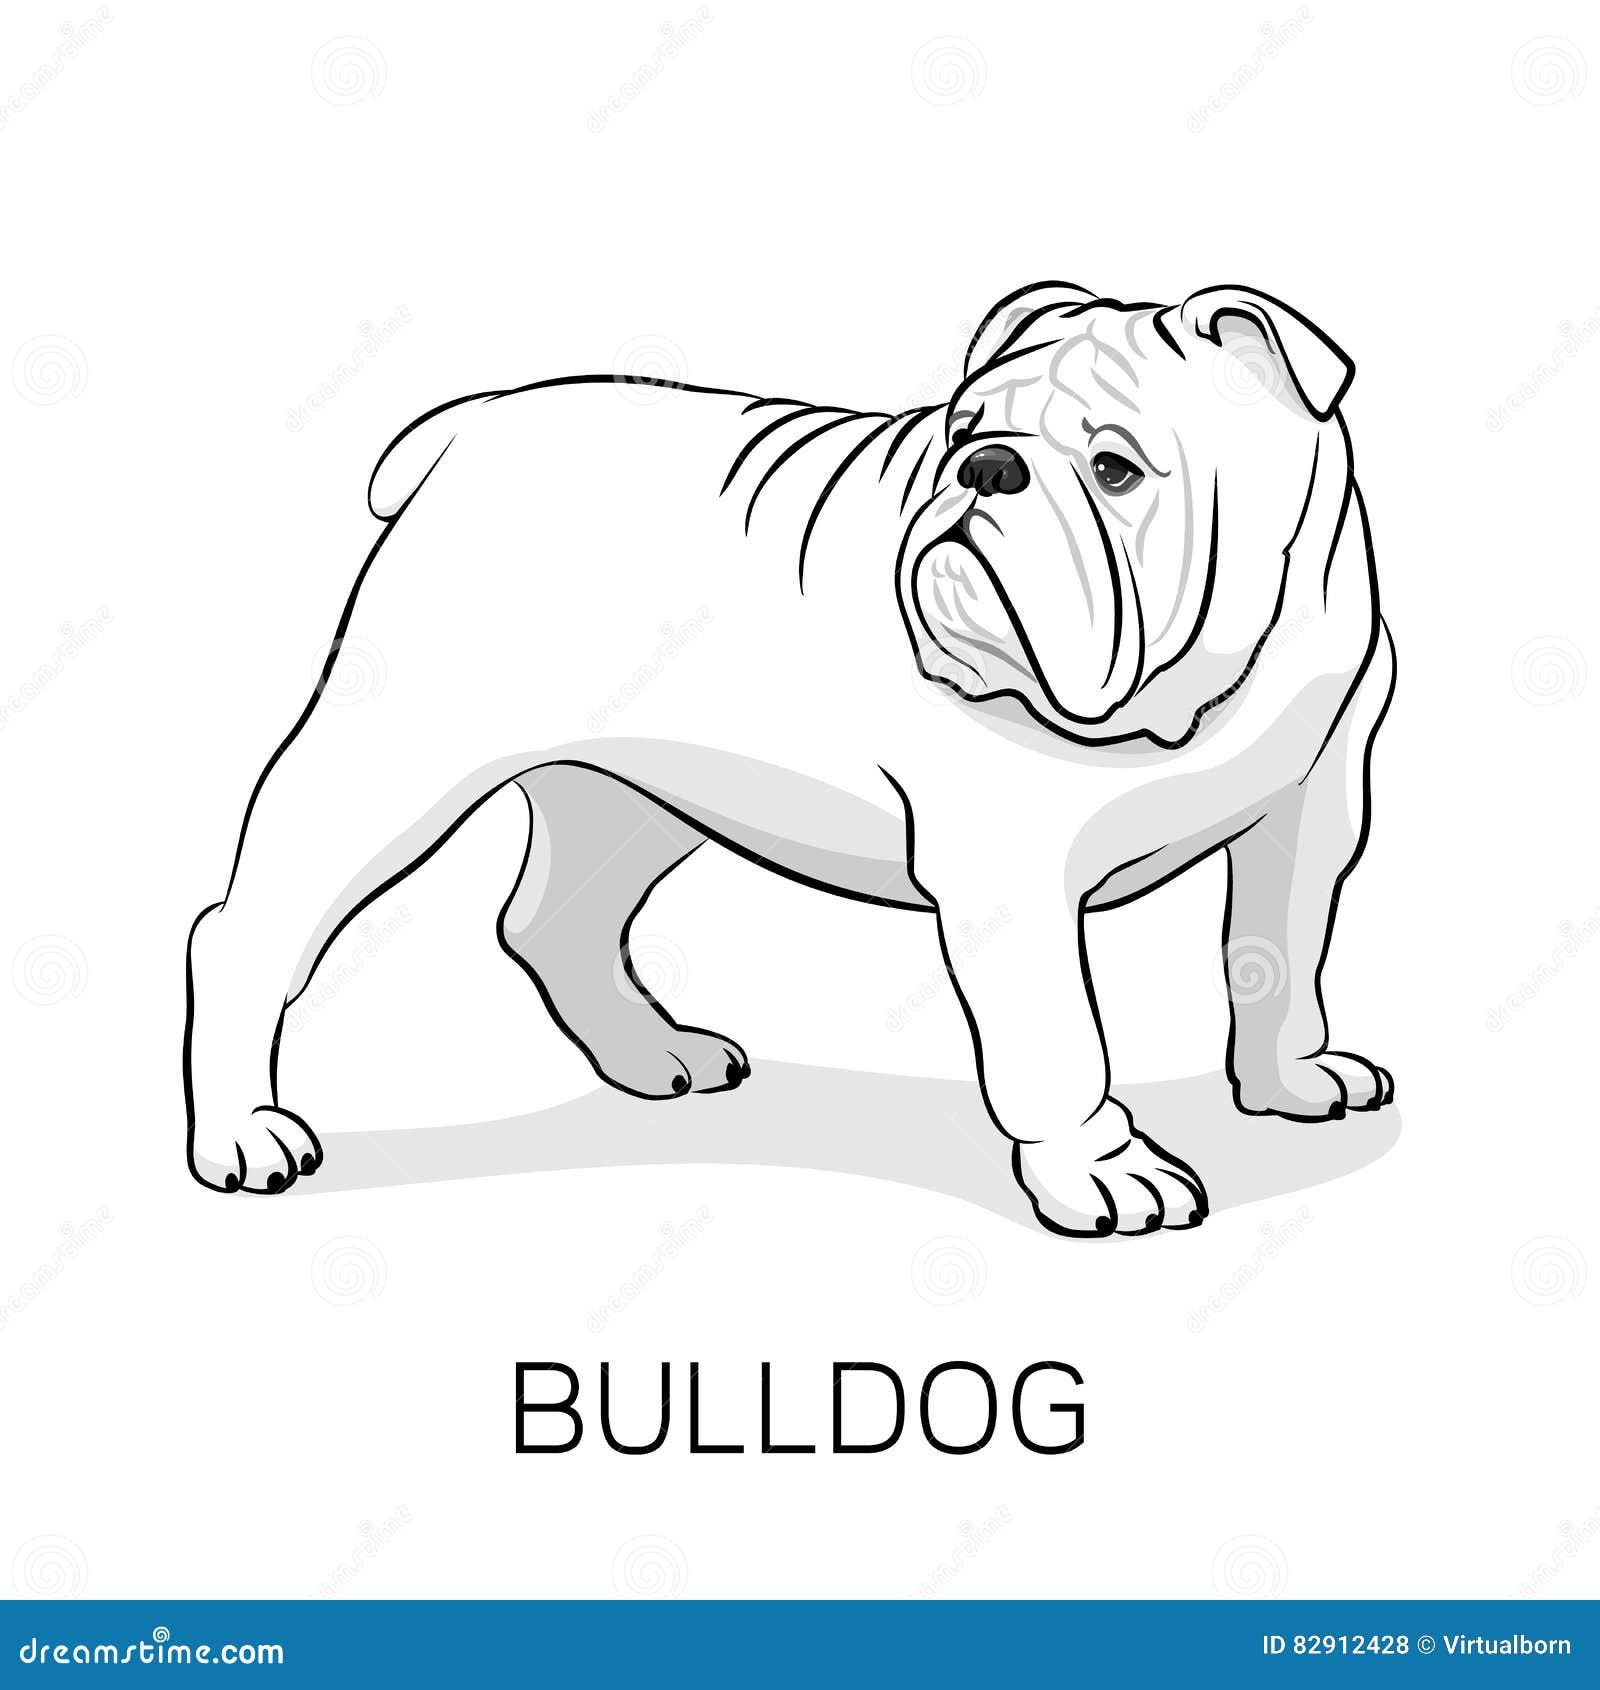 Karikatur Englisch Bulldogge Formate Env Und Jpg Vektor Abbildung